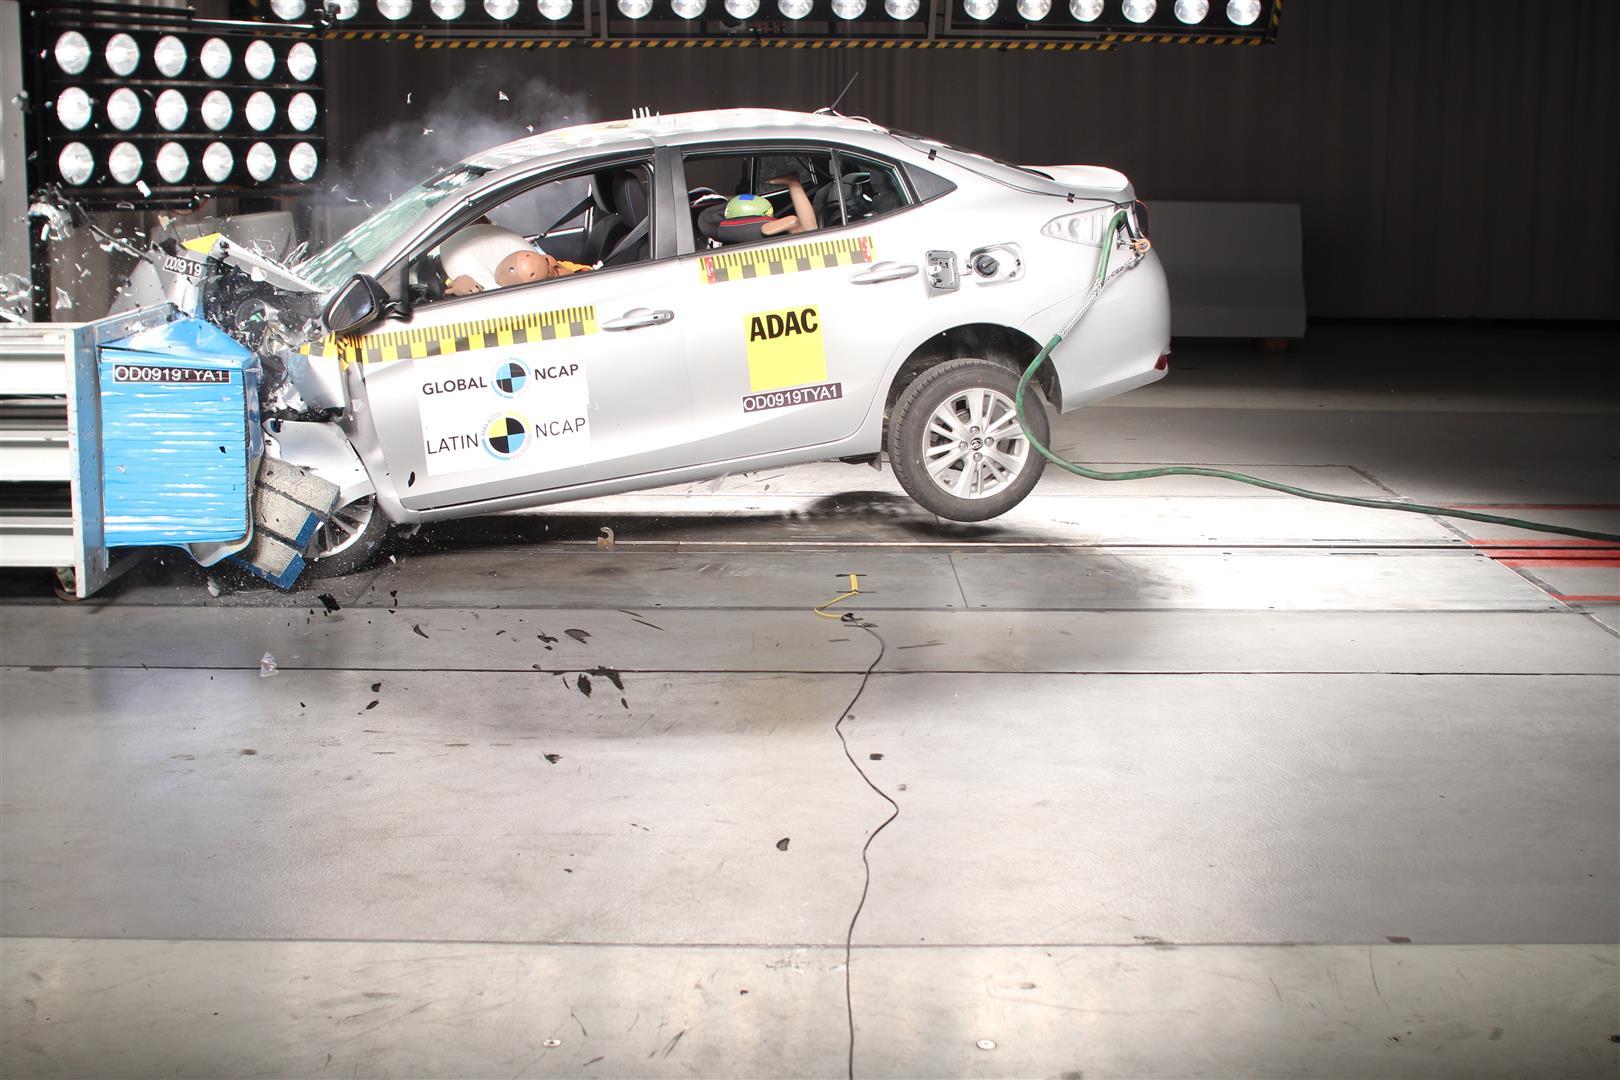 Latin Ncap divulgou o resultado dos testes de impacto de dois modelos lançados recentemente no Brasil: Volkswagen T-Cross e Toyota Yaris.